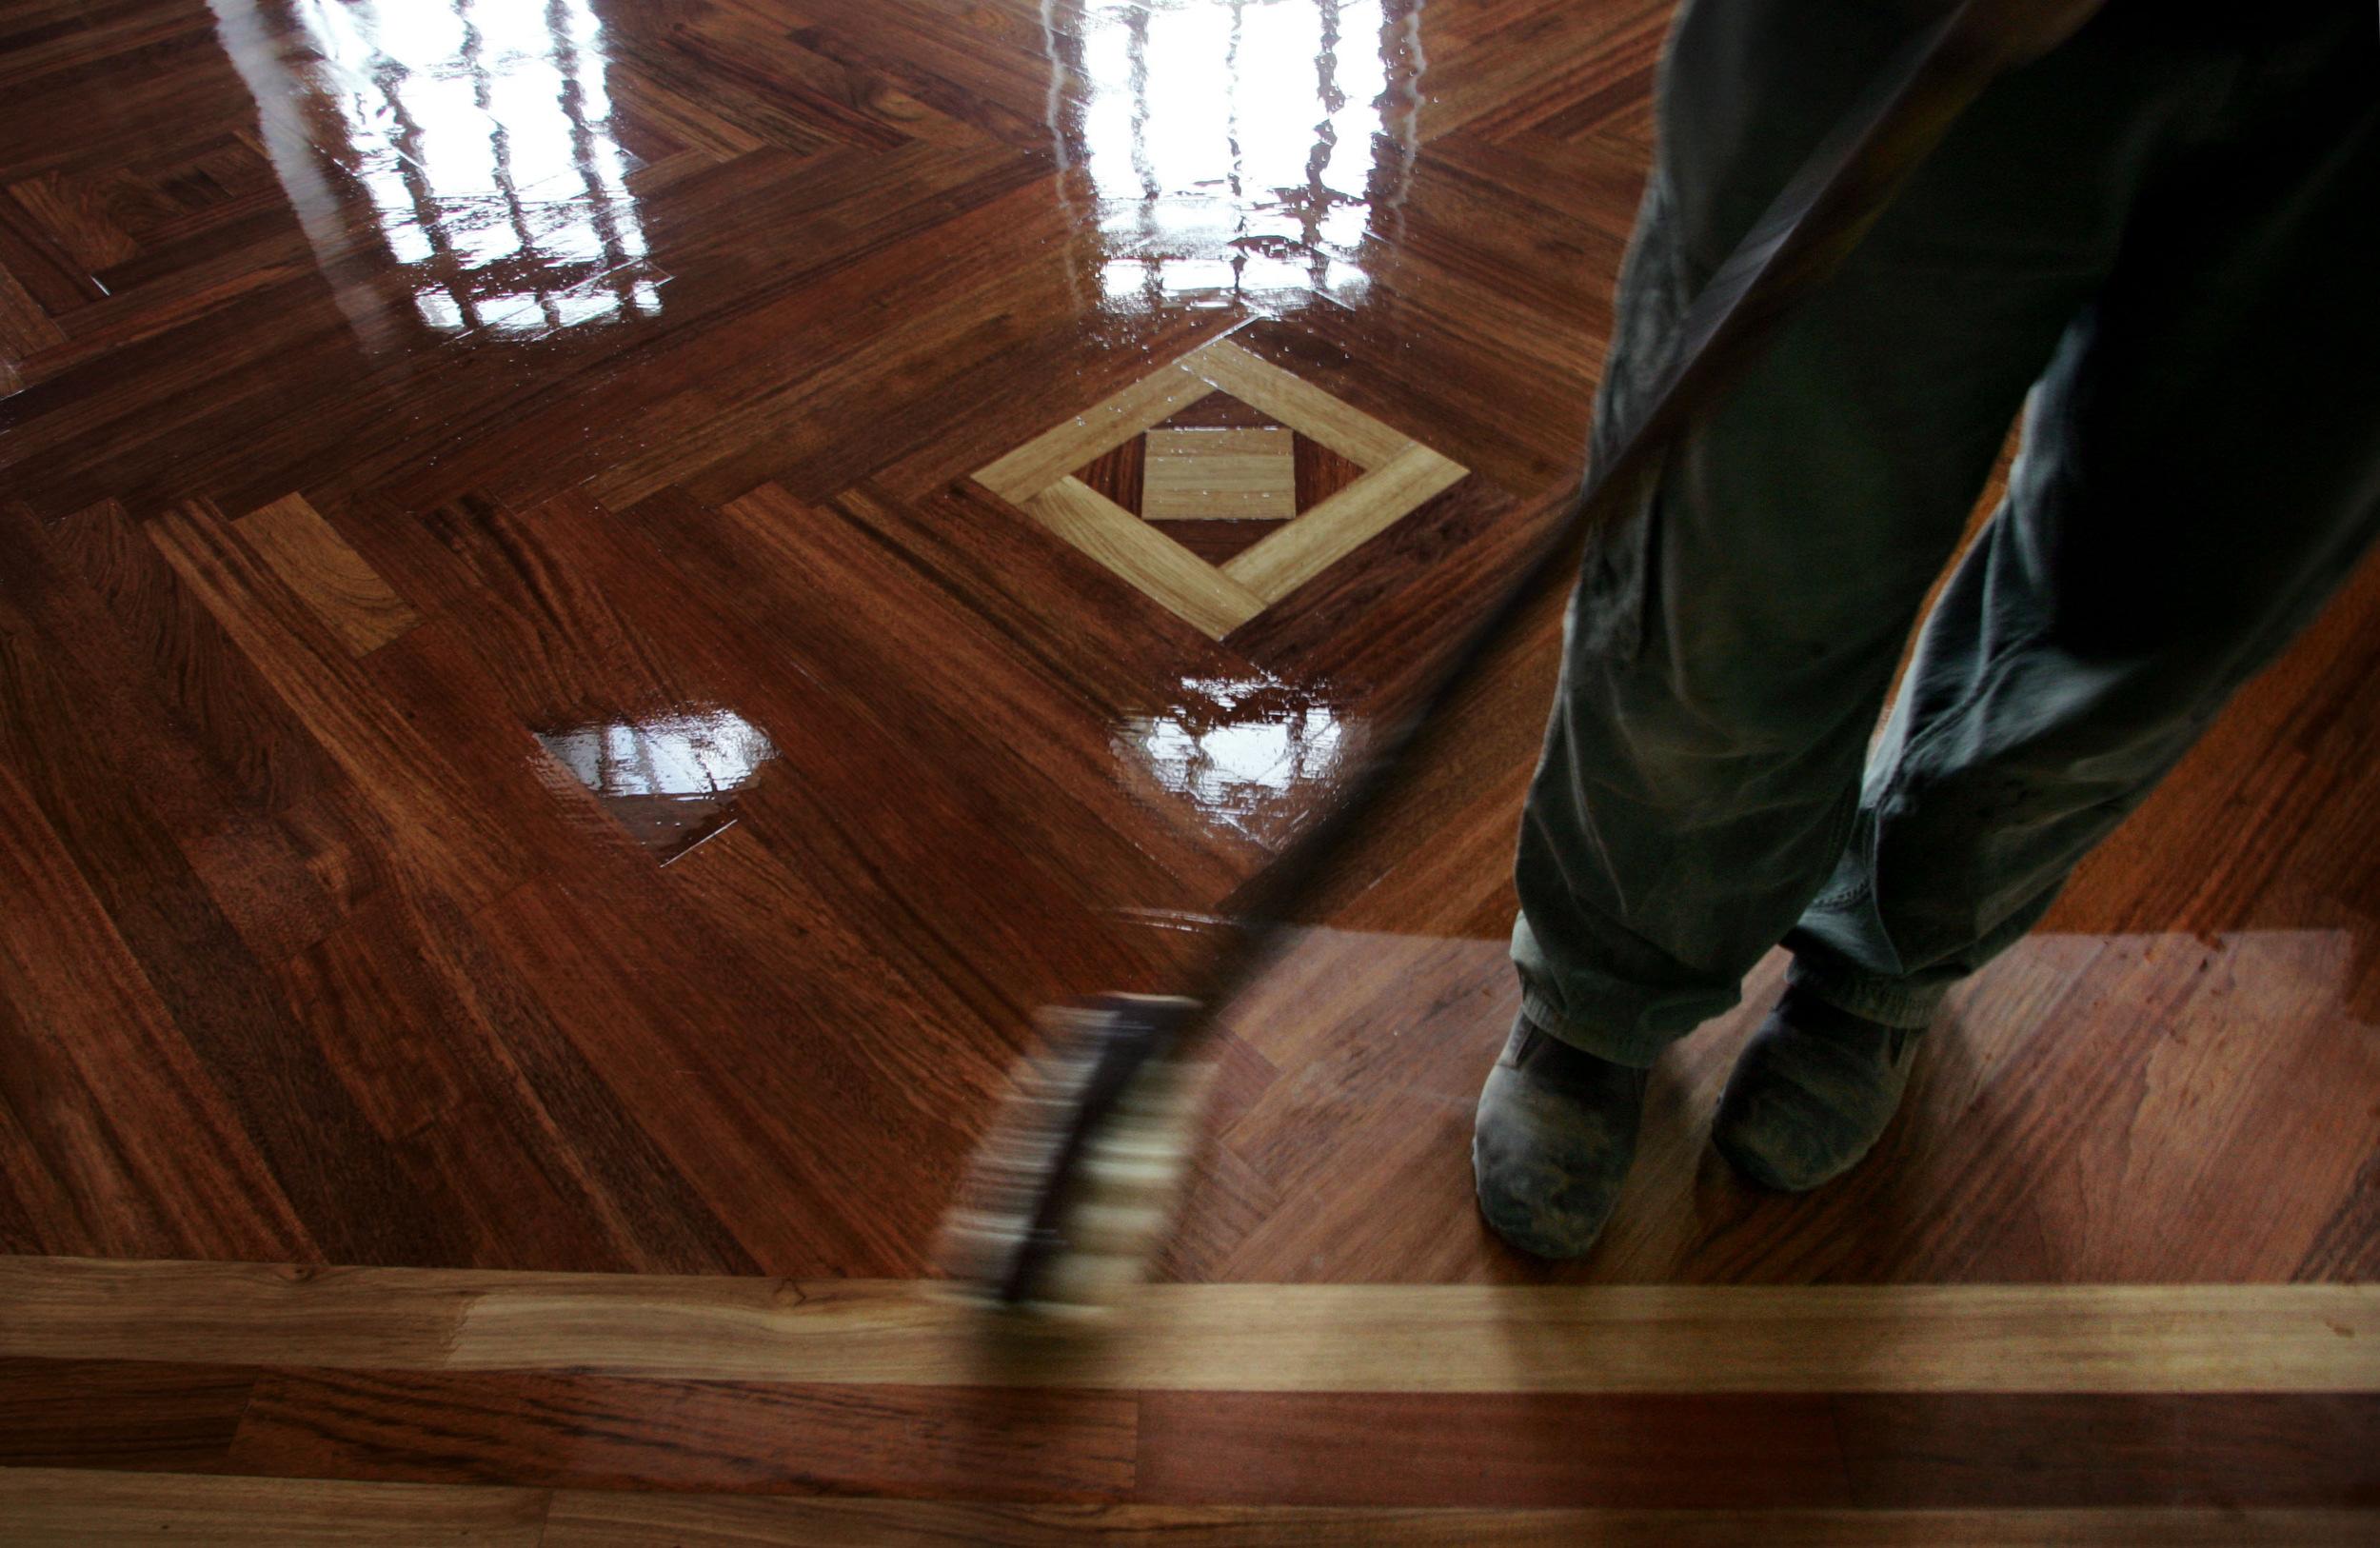 Mark Hollaway of Floor Works adds a final coat of polish onto the Brazilian cherry wood floors.